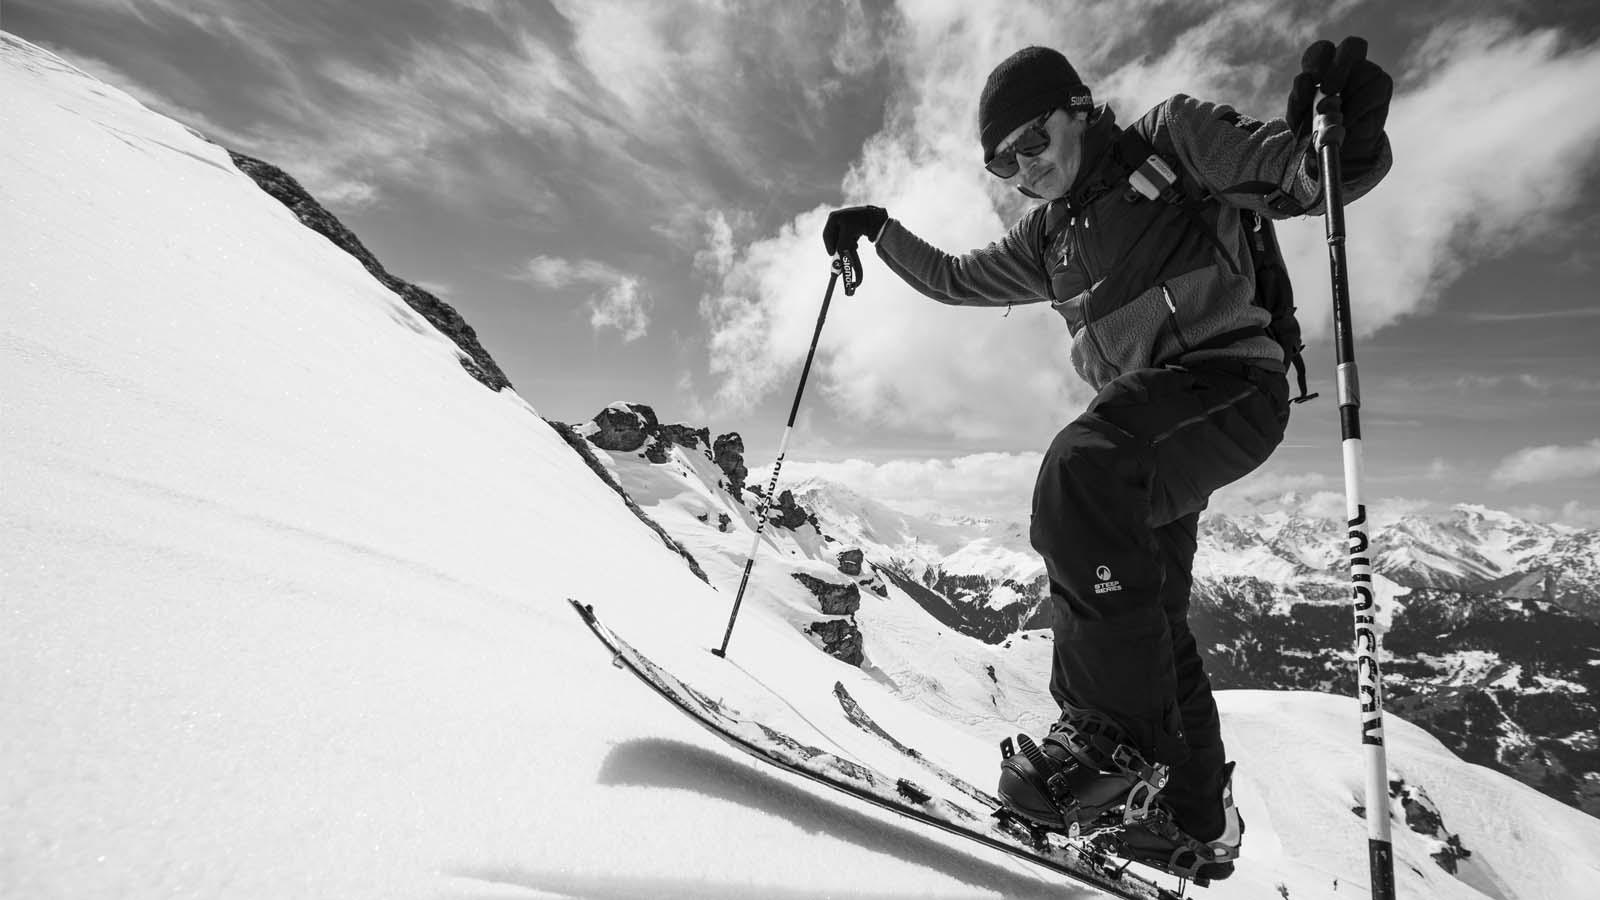 Rossignol 21/22 Snowboard Bindings Preview